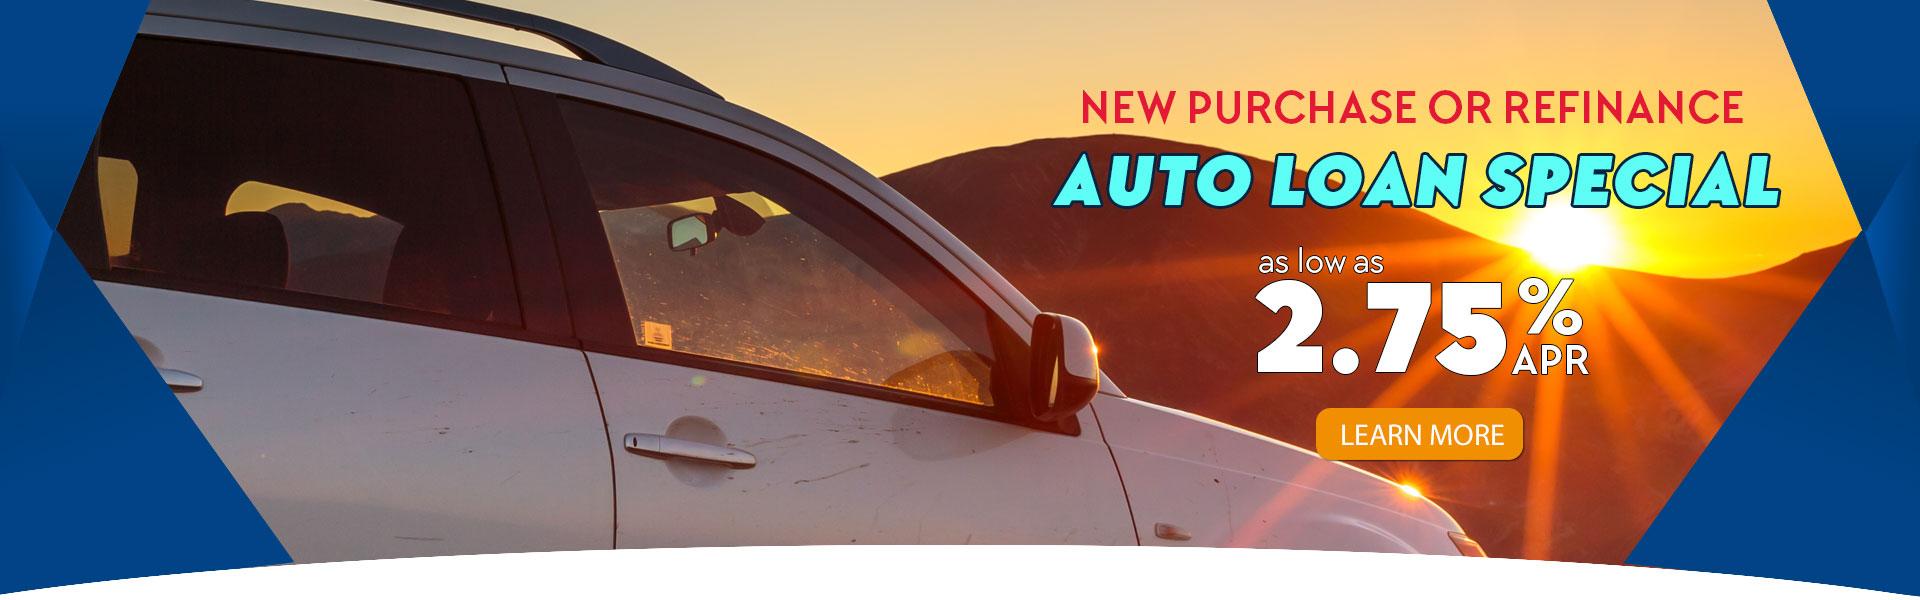 2.75% APR Auto Loan Special